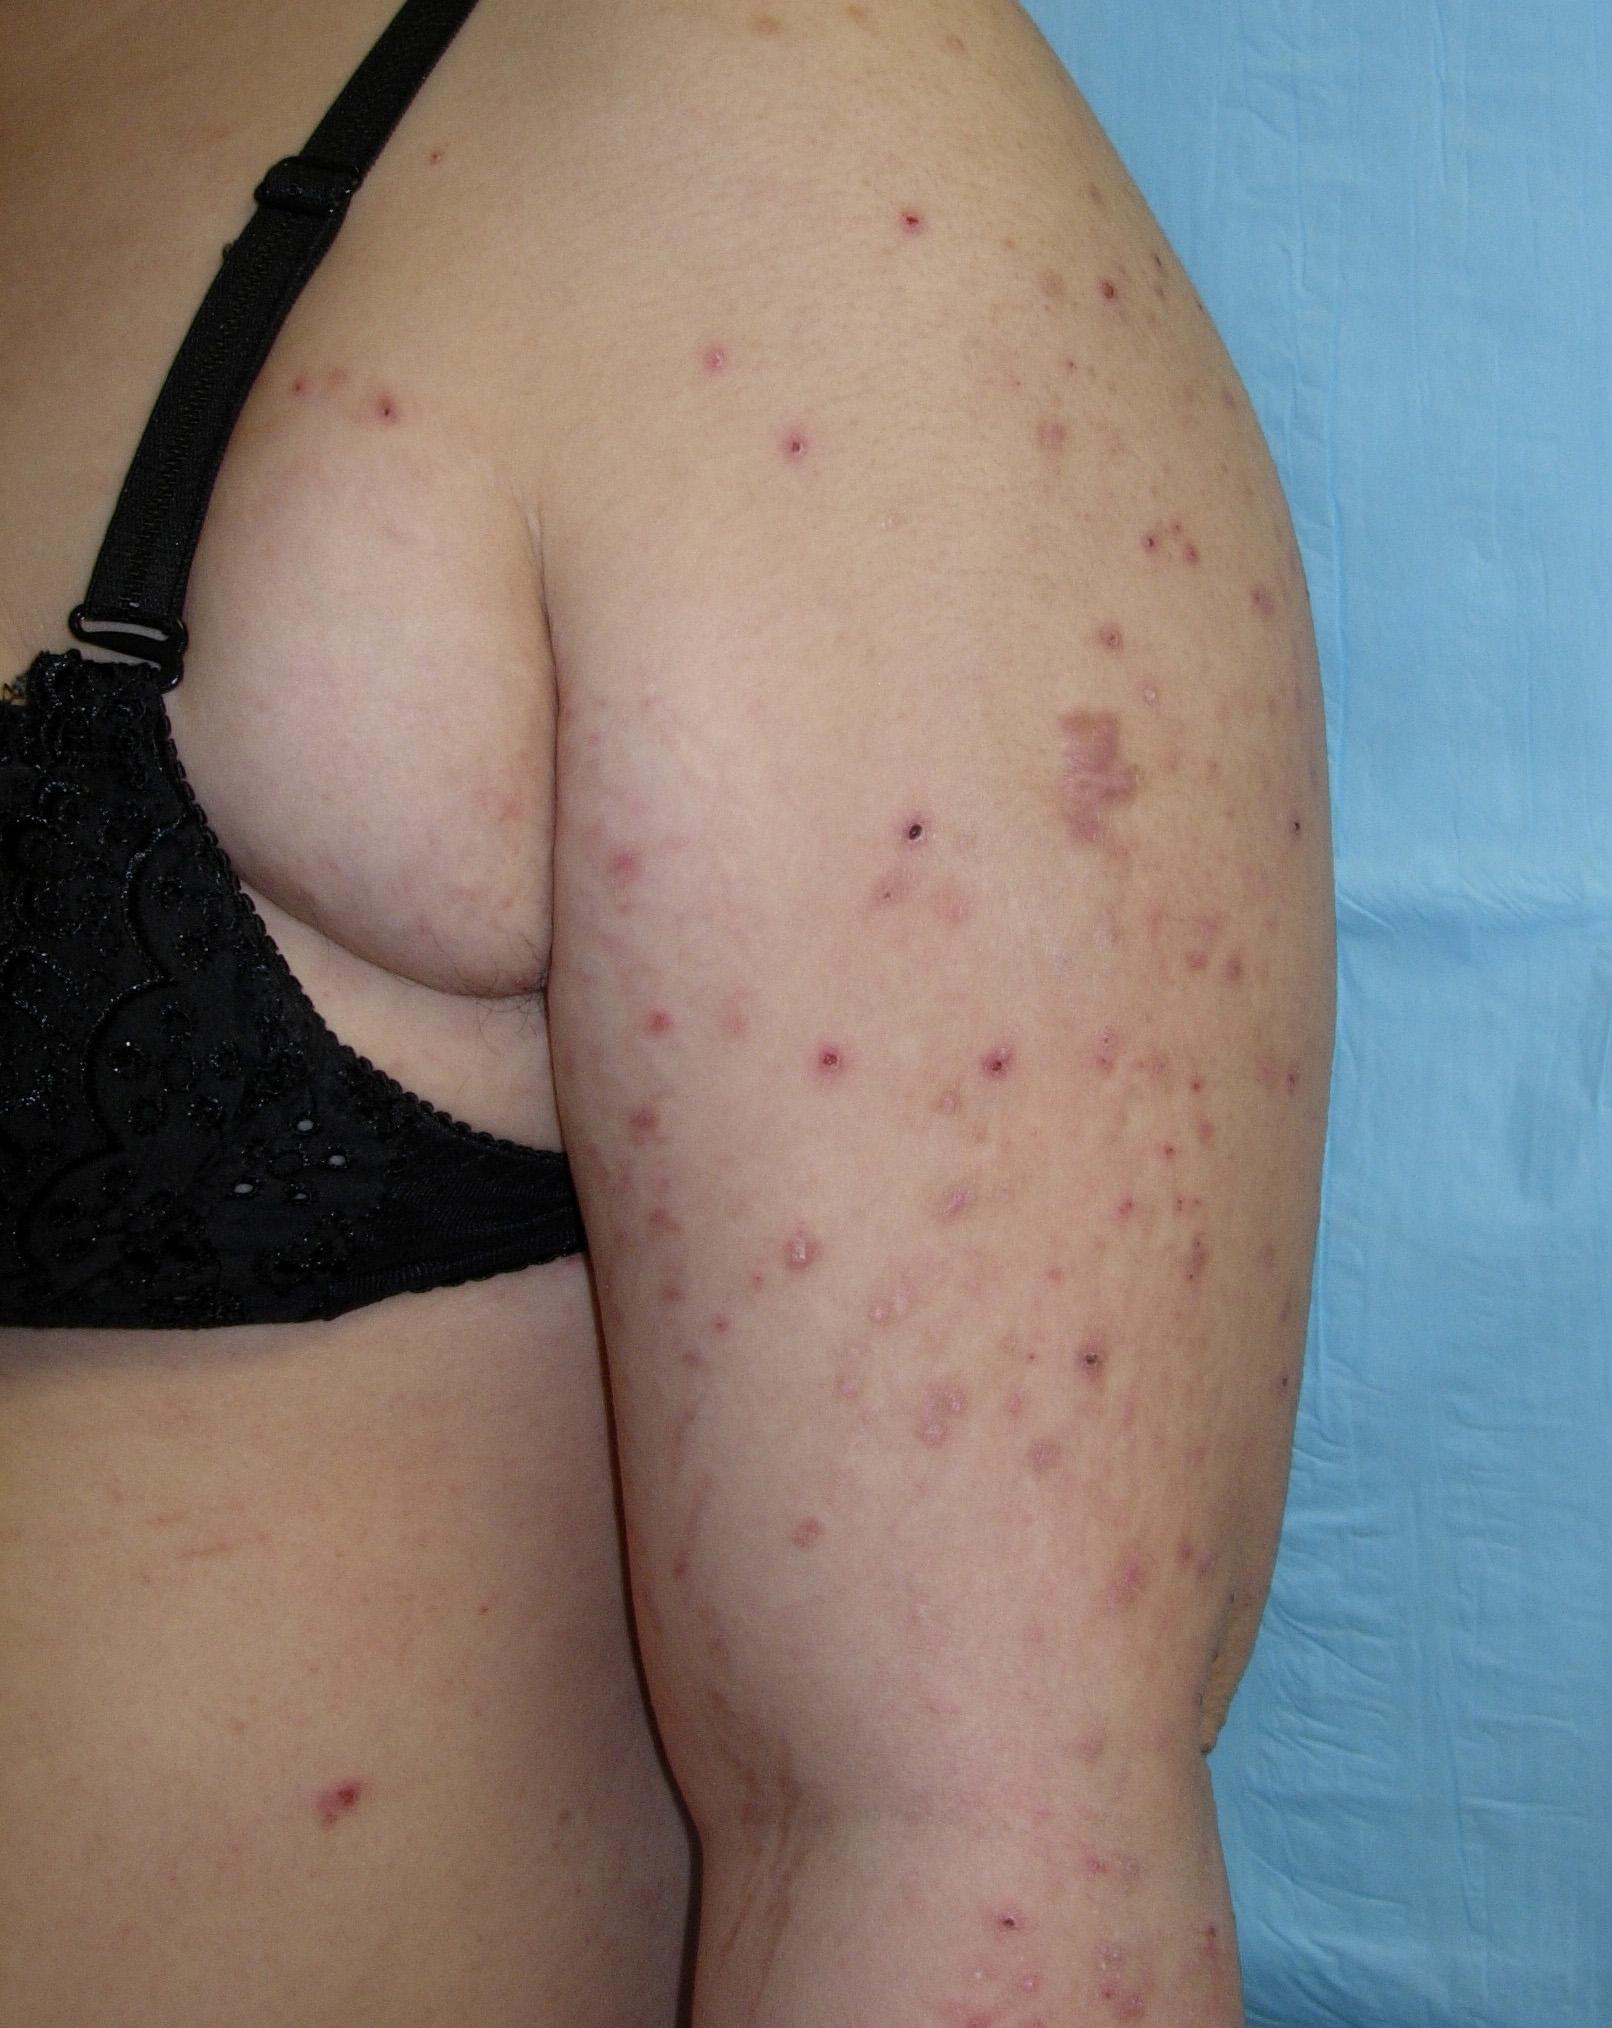 skin problems after pregnancy)